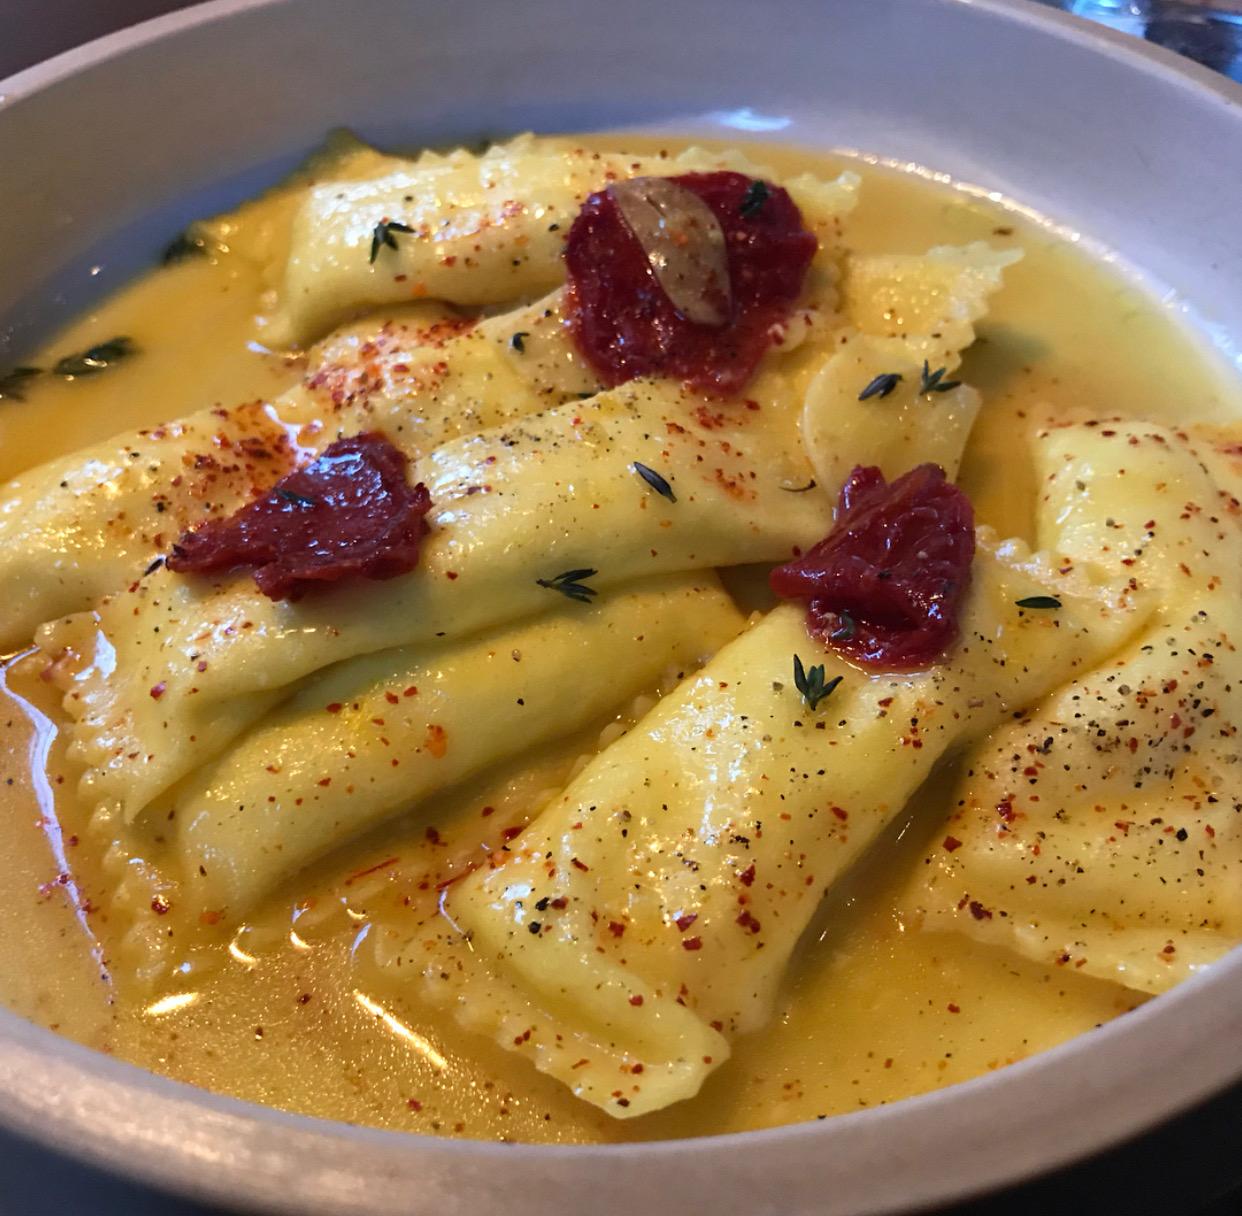 The incredible honey garlic ricotta agnolotti at Lilia.